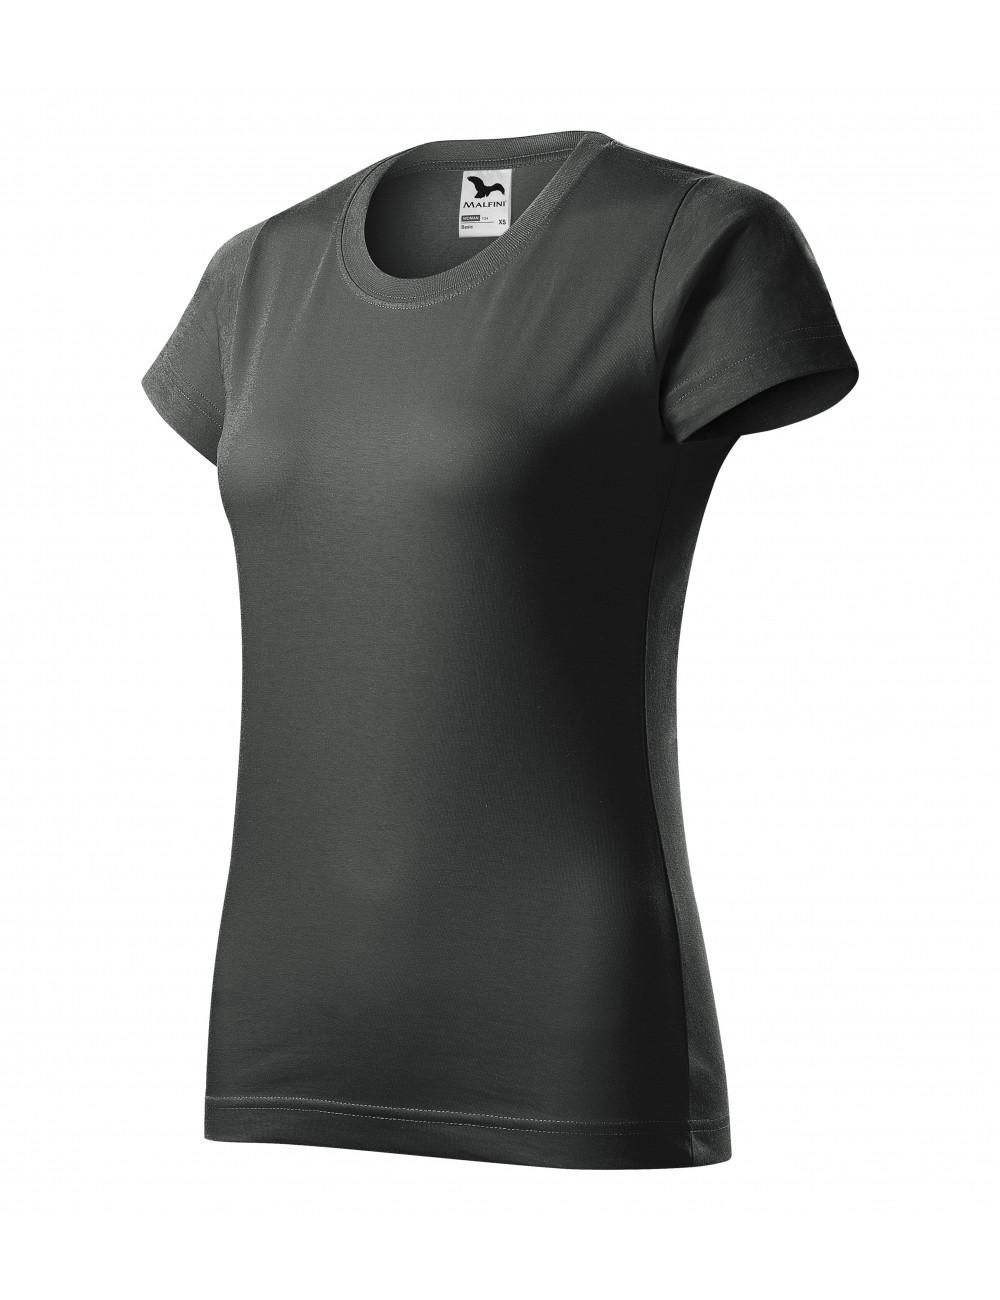 Adler MALFINI Koszulka damska Basic 134 ciemny khaki